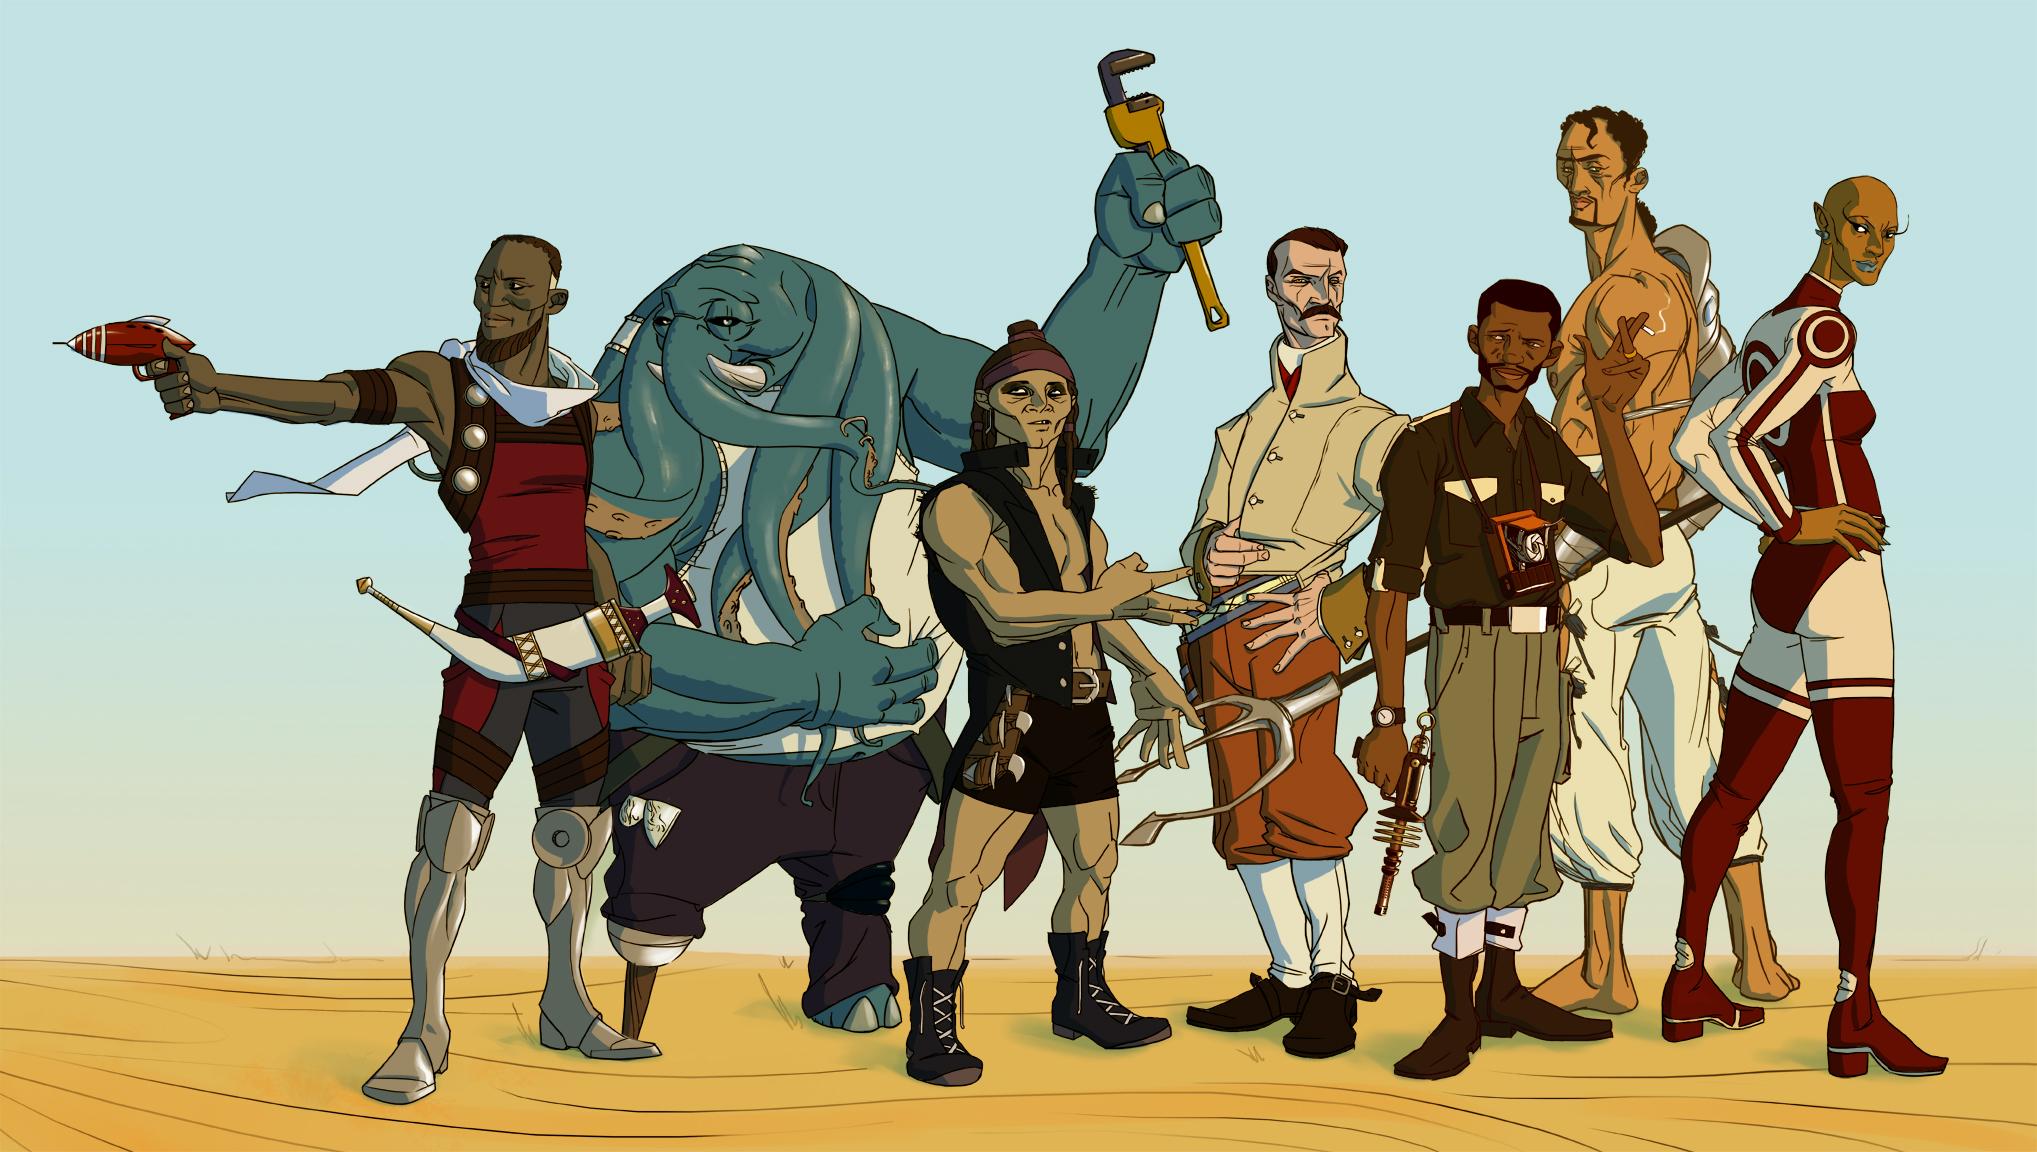 The Jupiter Jonah cast, from left to right; Denarii, Blass, Rashidi, Stein, Jonah, Prospero, and Funlola - Art by Shof